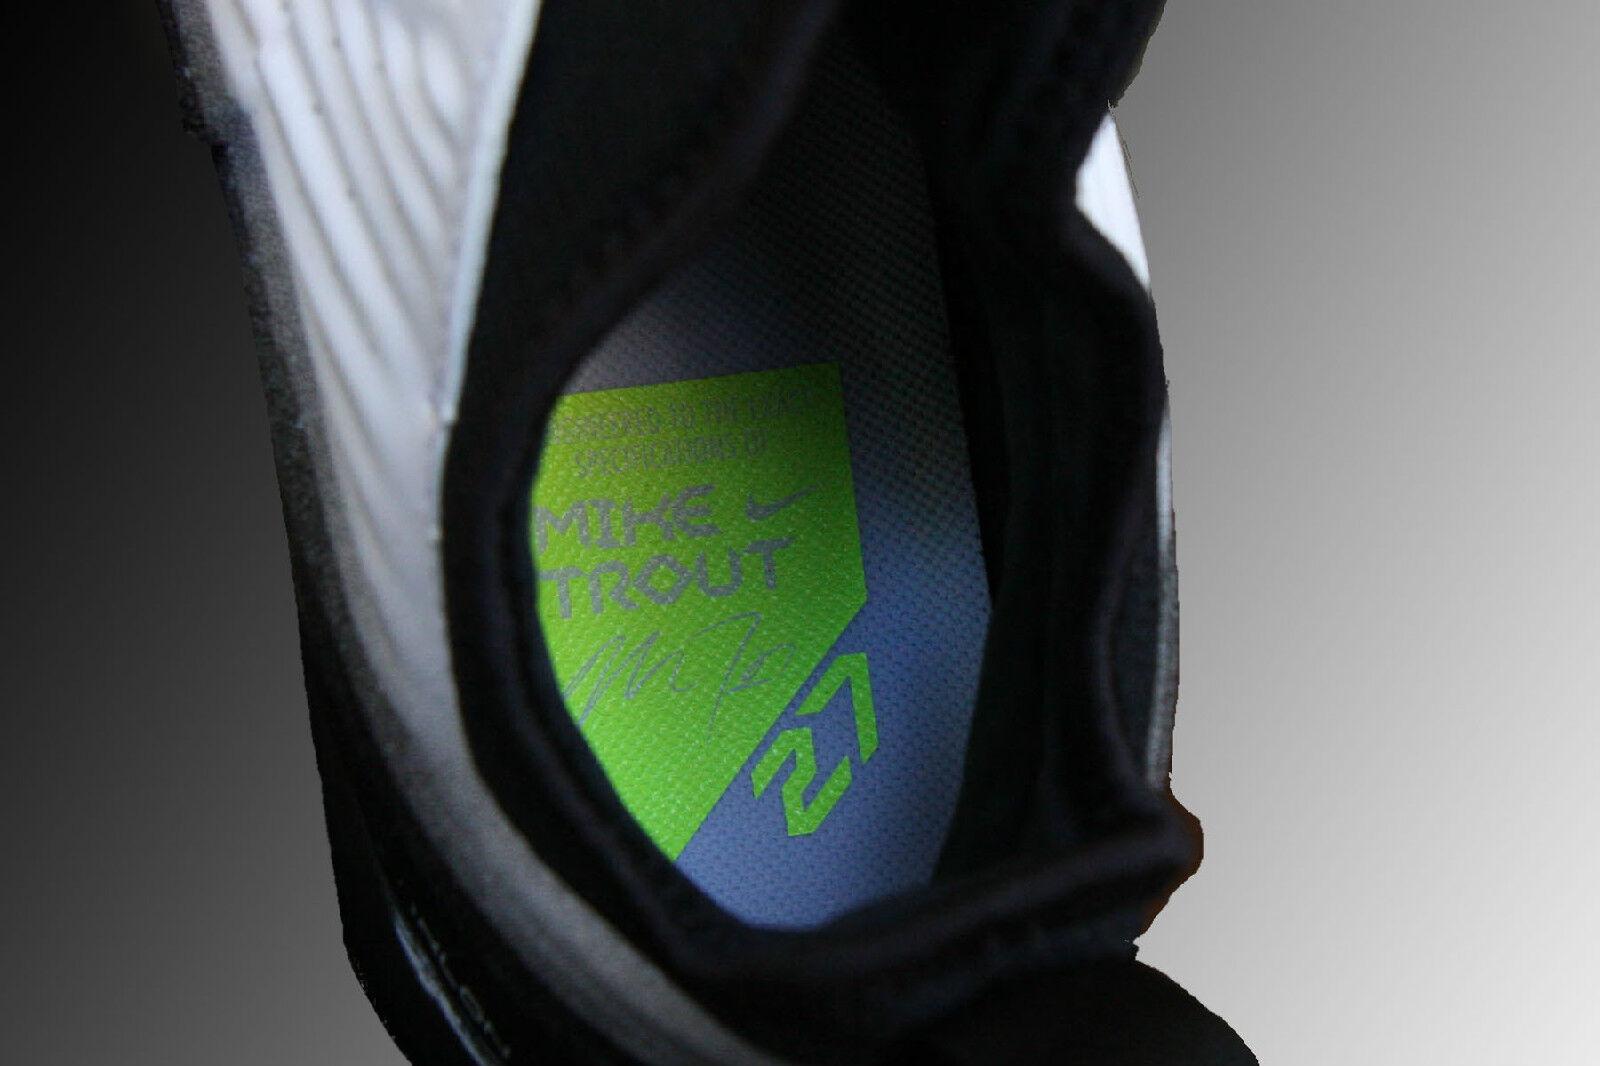 Nike Nike Nike männer lunar vapor forellen metall größe 13 baseball - stollen 654853 100 ae0a31